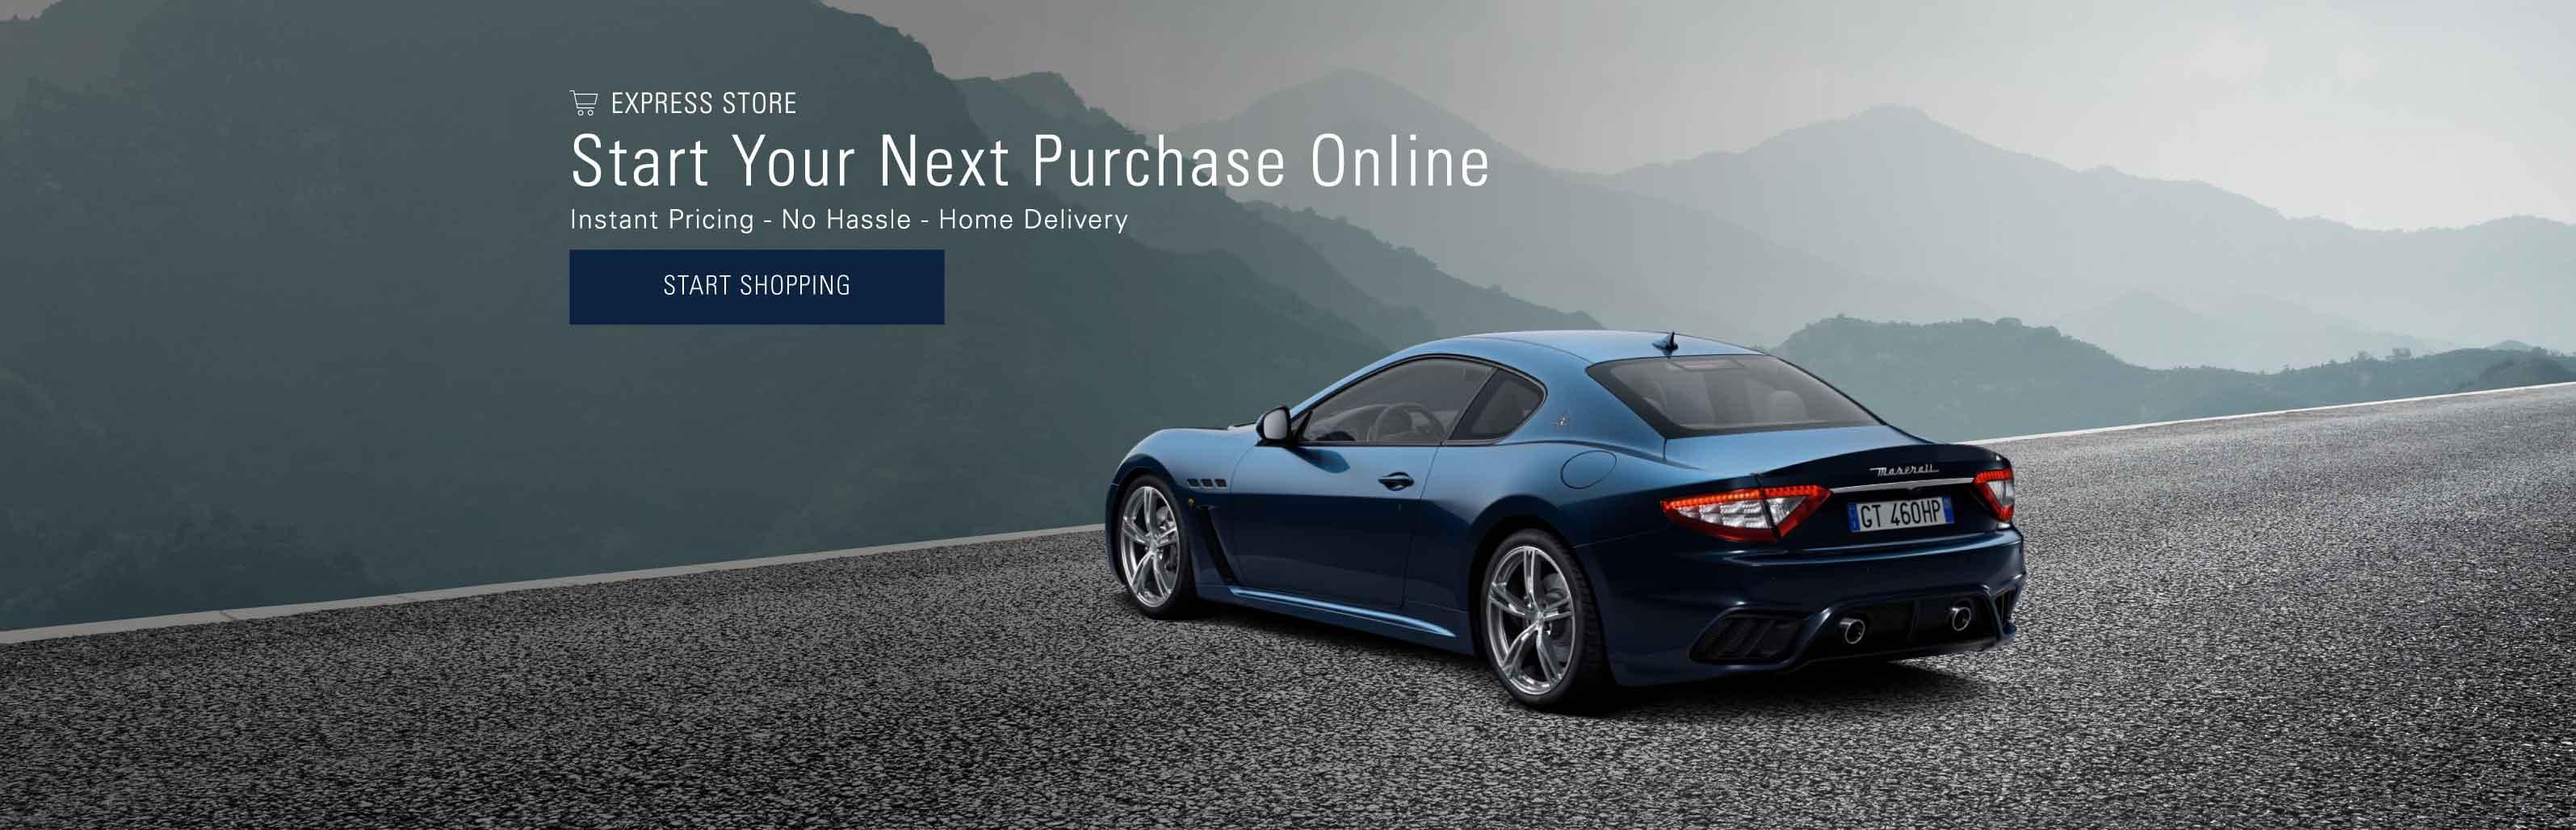 Discover Maserati Luxury Cars At Maserati Of Fort Lauderdale